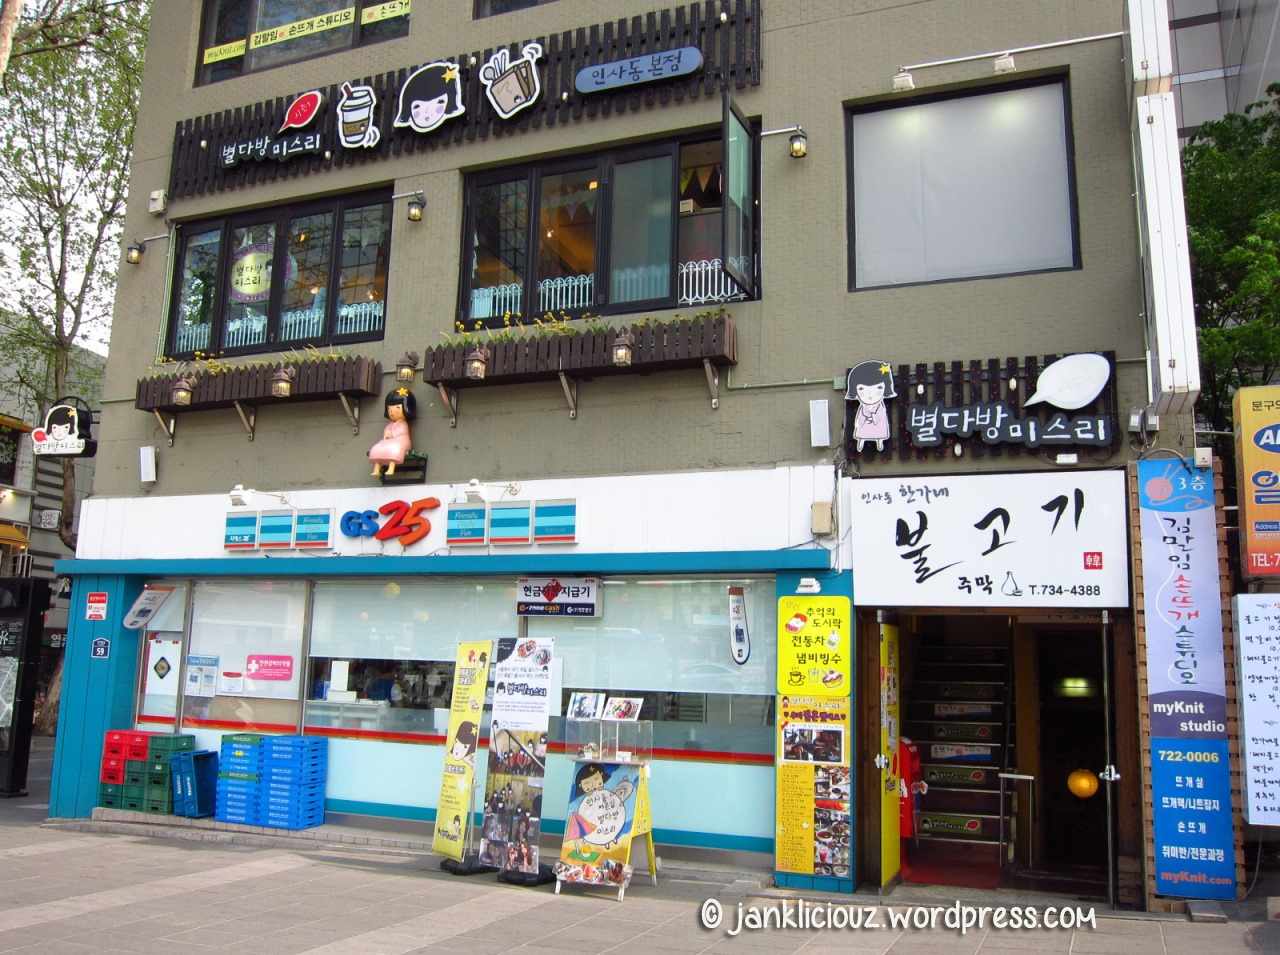 Miss Lee Cafe (별다방 미스리)